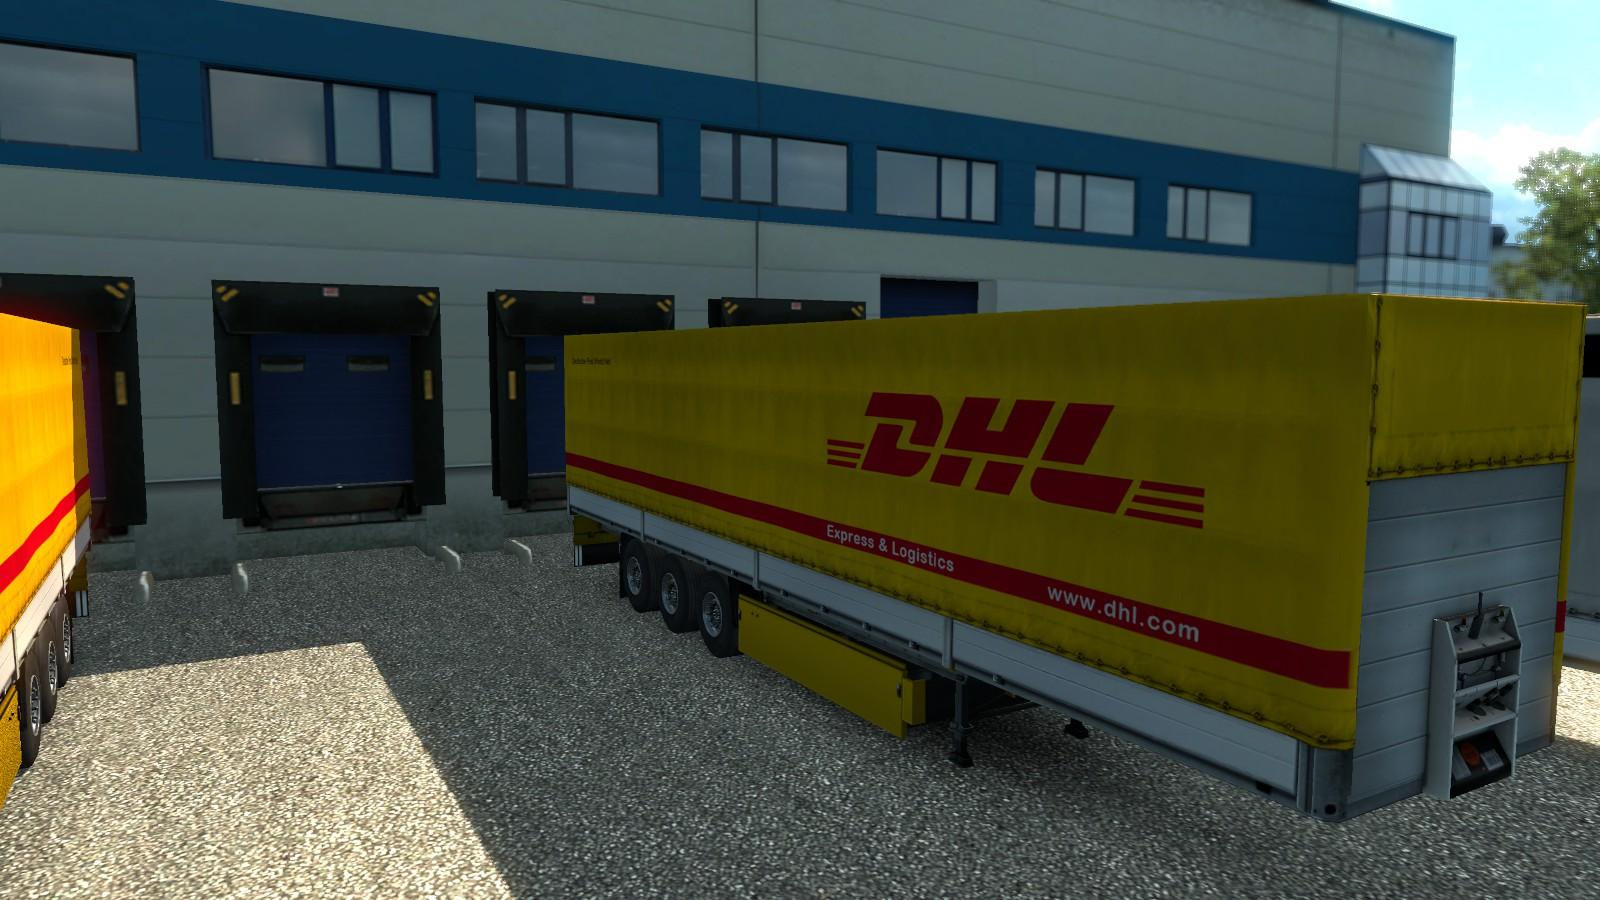 dhl-trailer-47-cargo-1-21-x_1